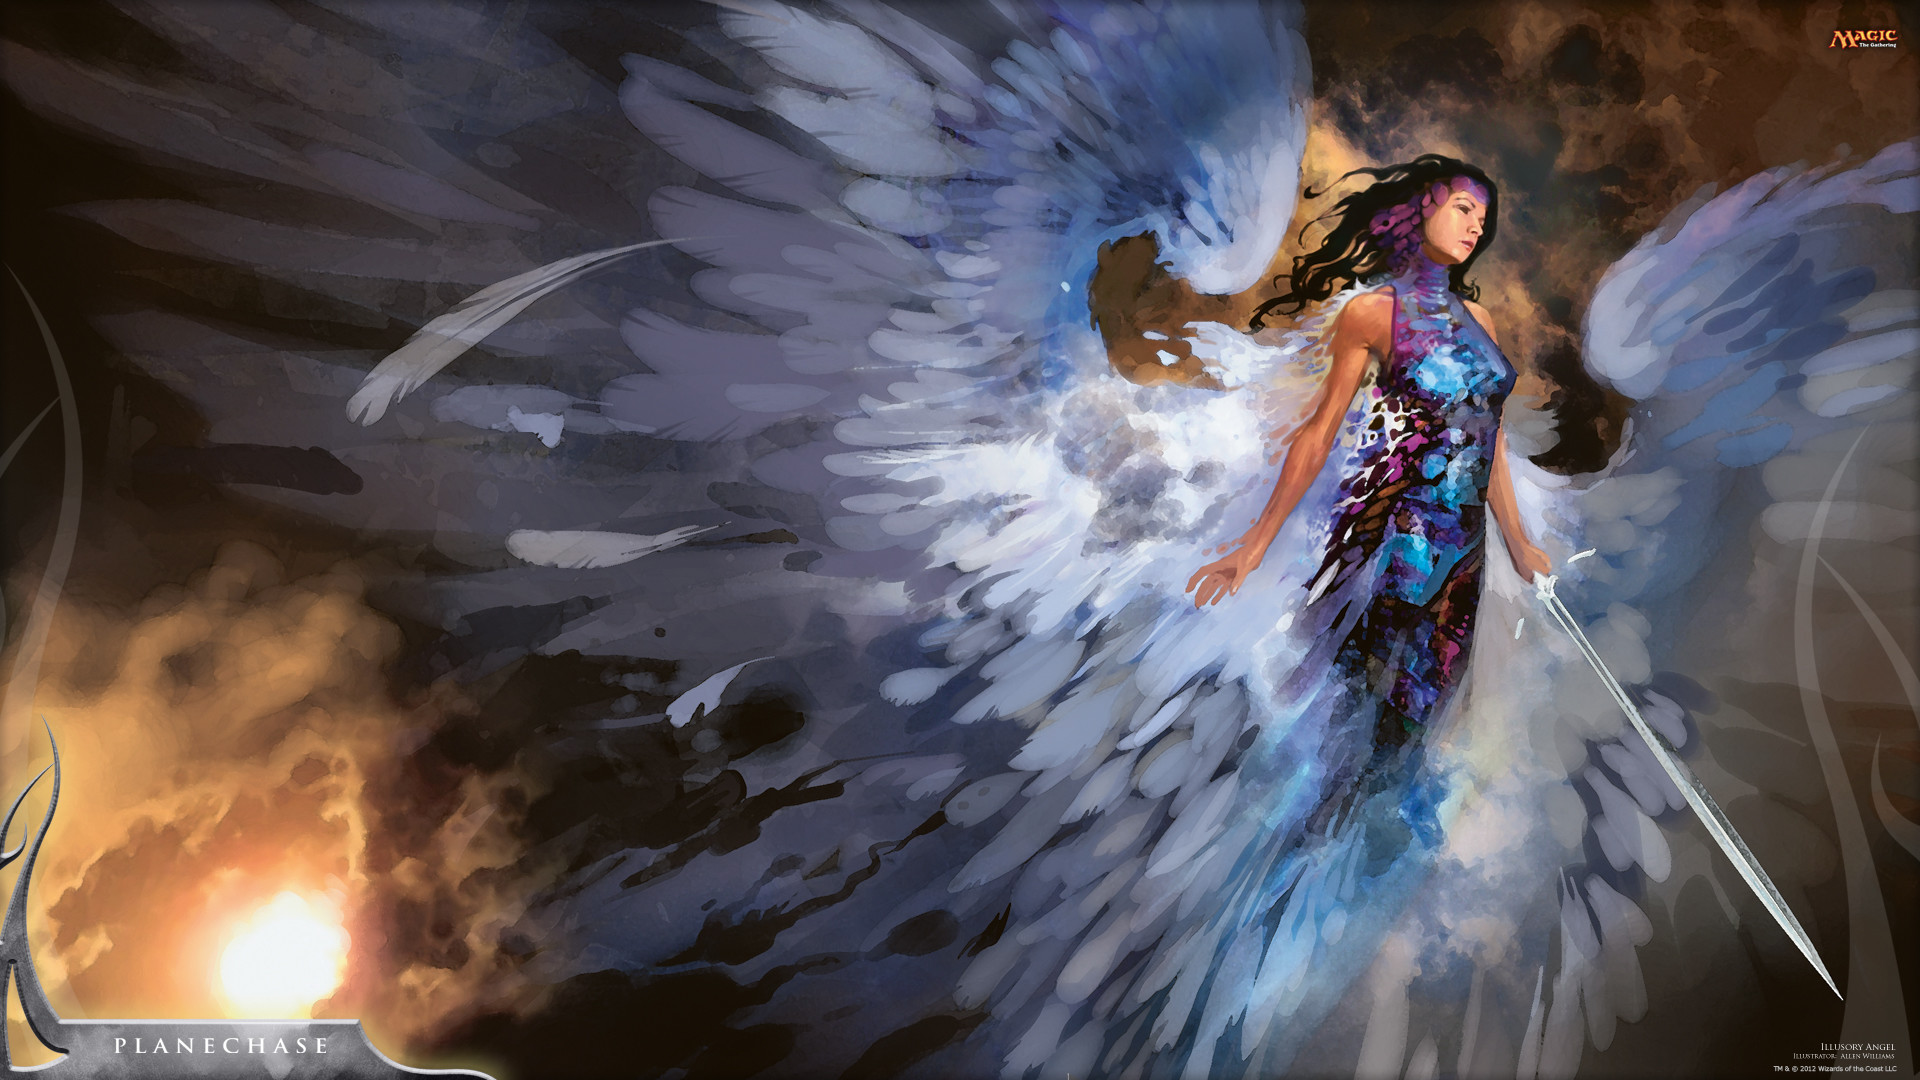 Warrior Angel Art | Warrior angel wallpaper | awesome wallpaper and  screensavers part 2 – digital (mostly) | Pinterest | Warrior angel, Angel  wallpaper and …